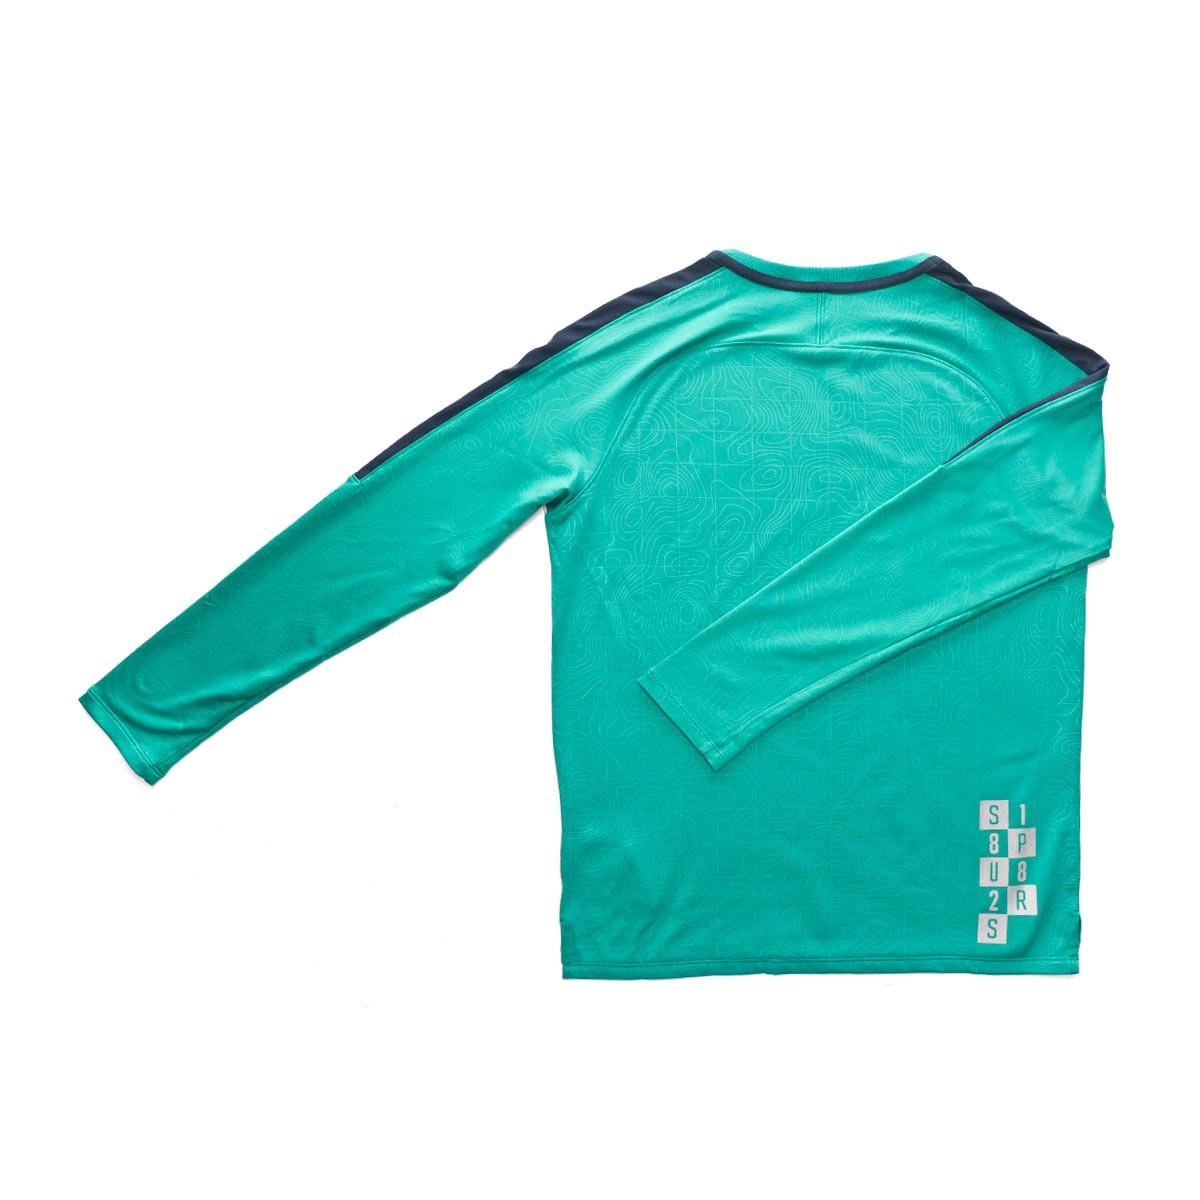 Sweatshirt Nike Kids Tottenham Hotspur Fc Squad 2018 2019 Neptune Green Armory Navy Football Store Futbol Emotion